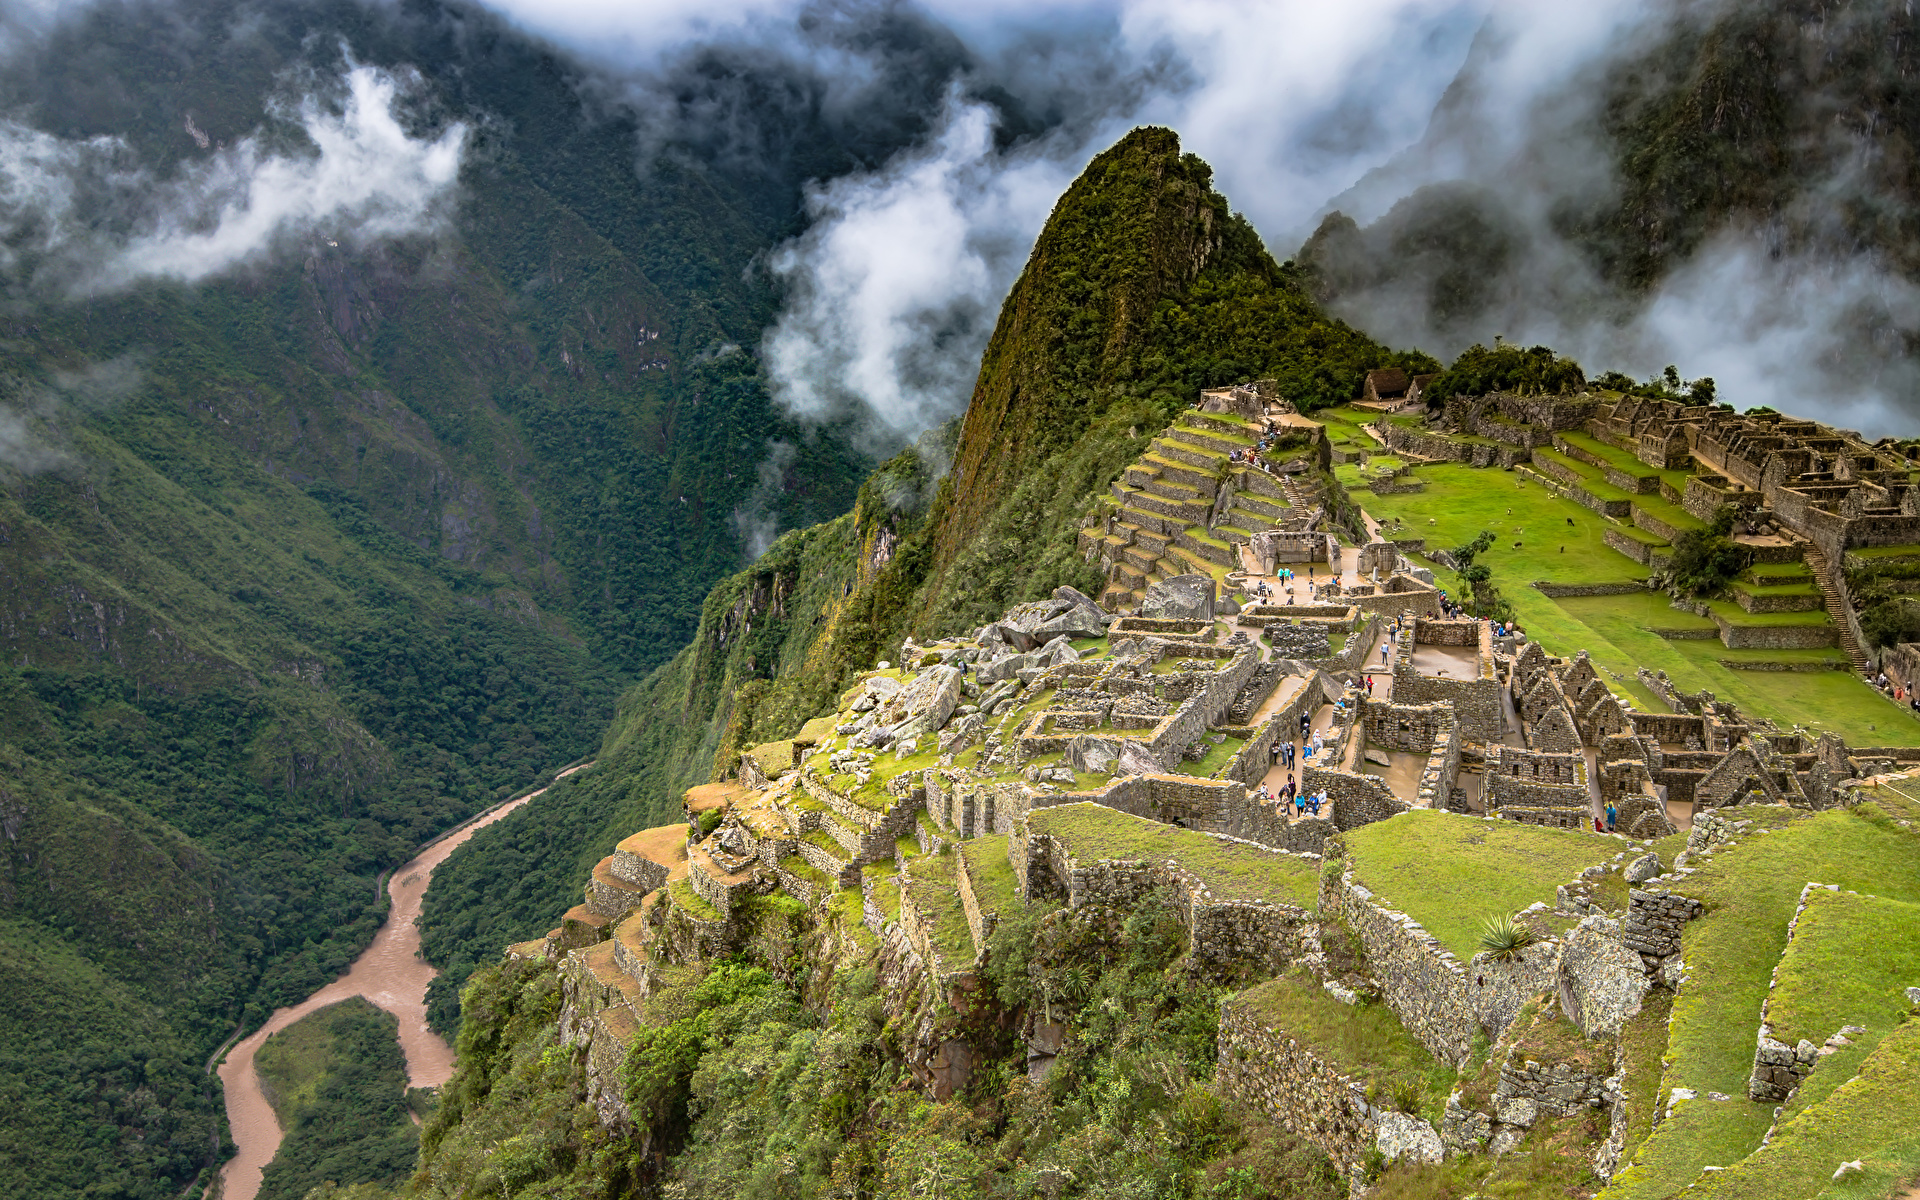 Desktop Hintergrundbilder Peru Machu Picchu Natur Gebirge Ruinen 1920x1200 Berg